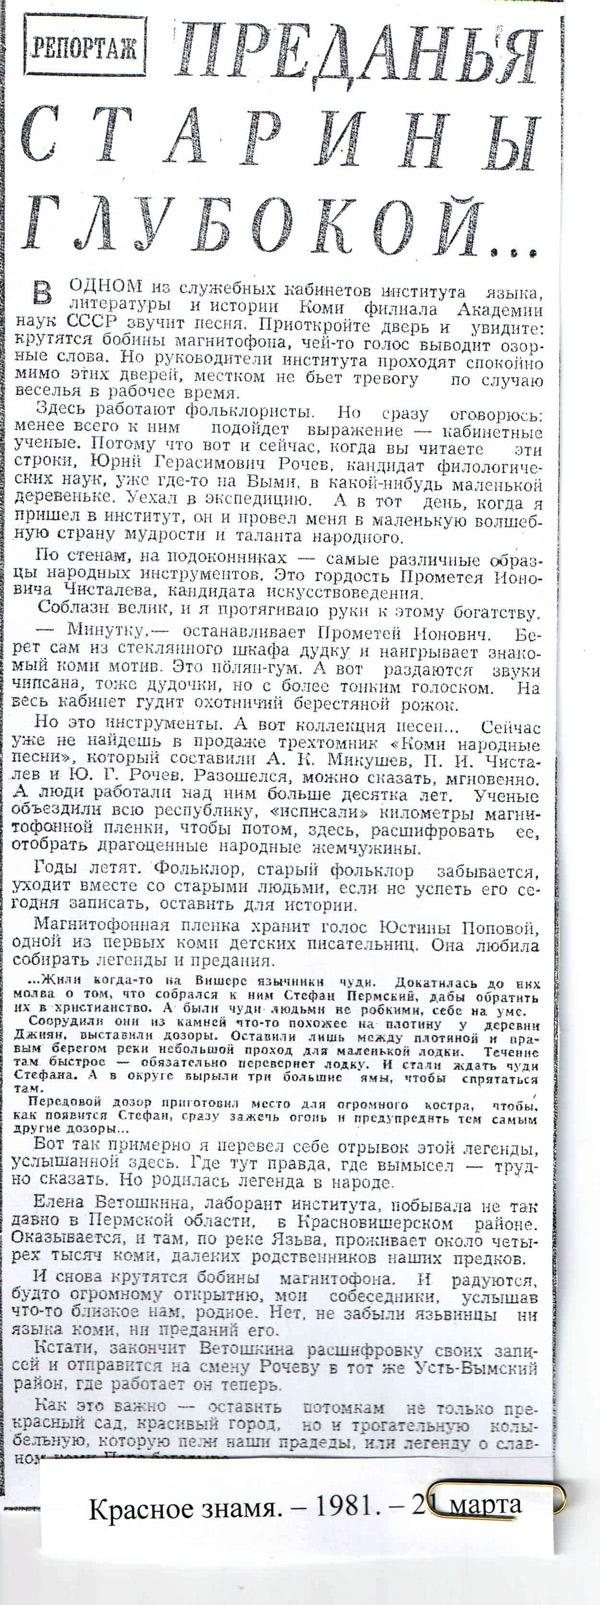 "Преданья старины глубокой (""Красное знамя"", 21 марта 1981 г.)"